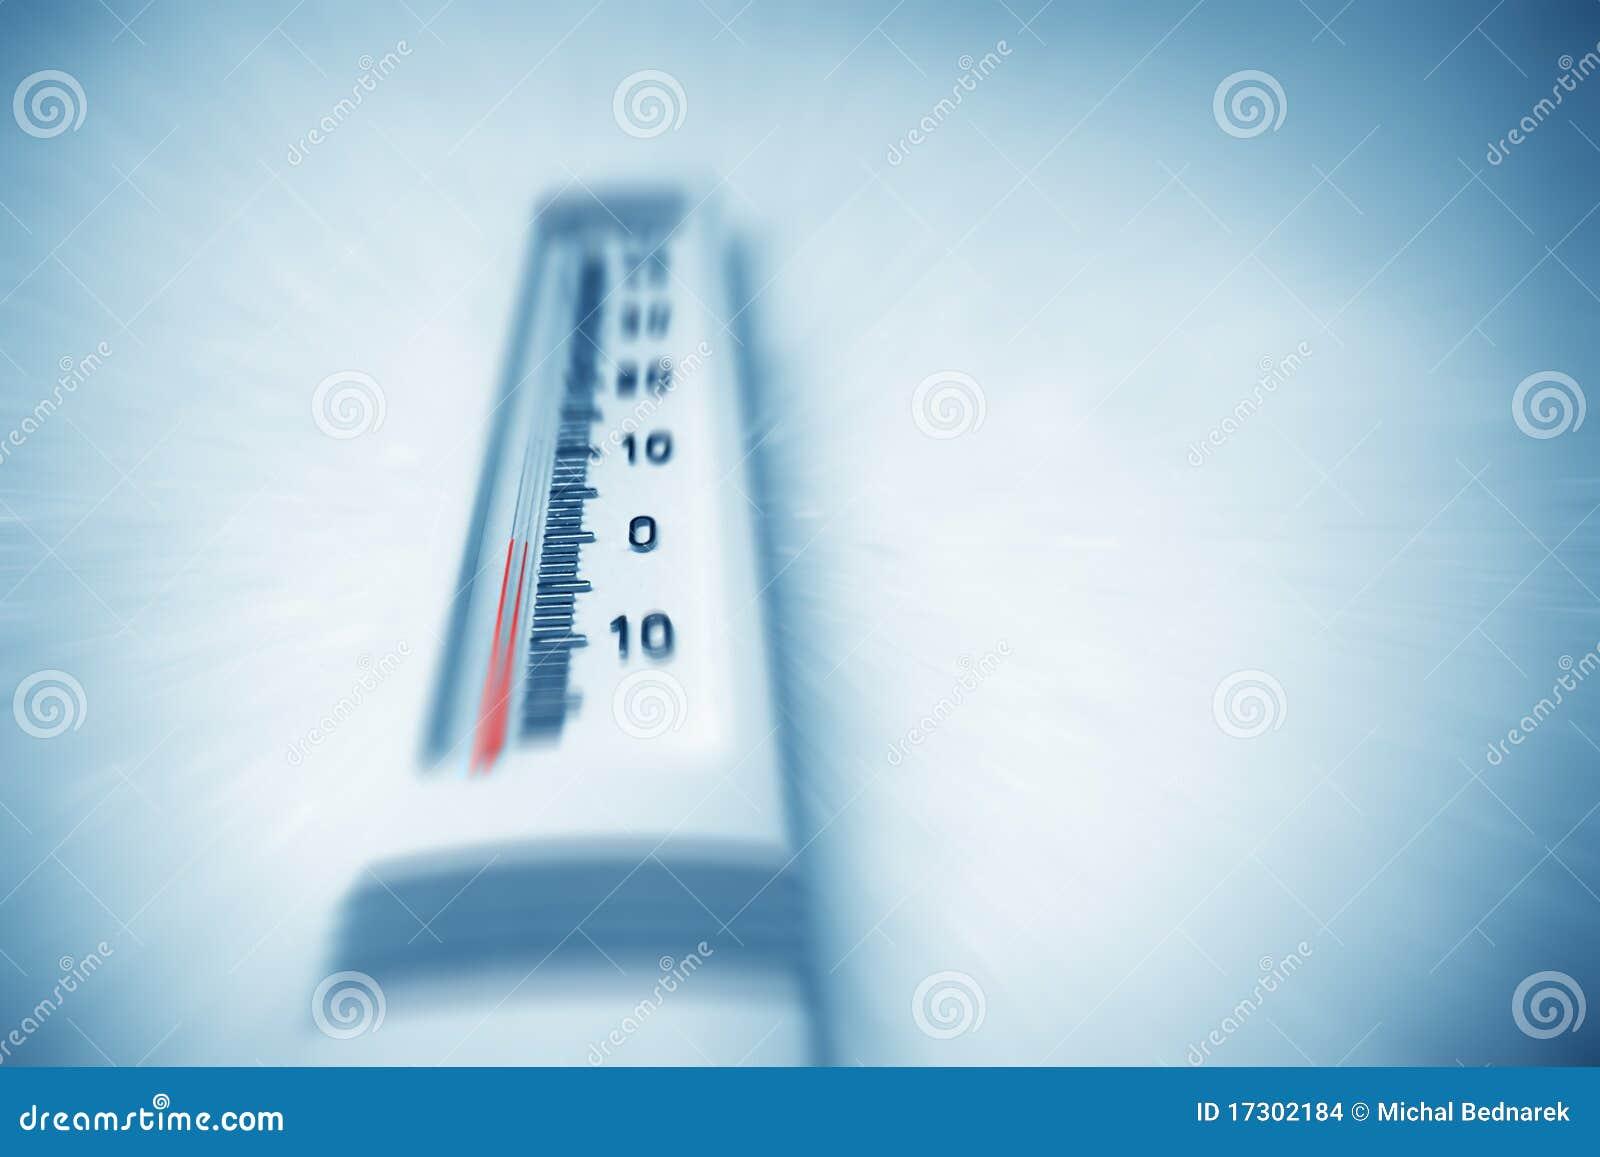 Below zero on thermometer.